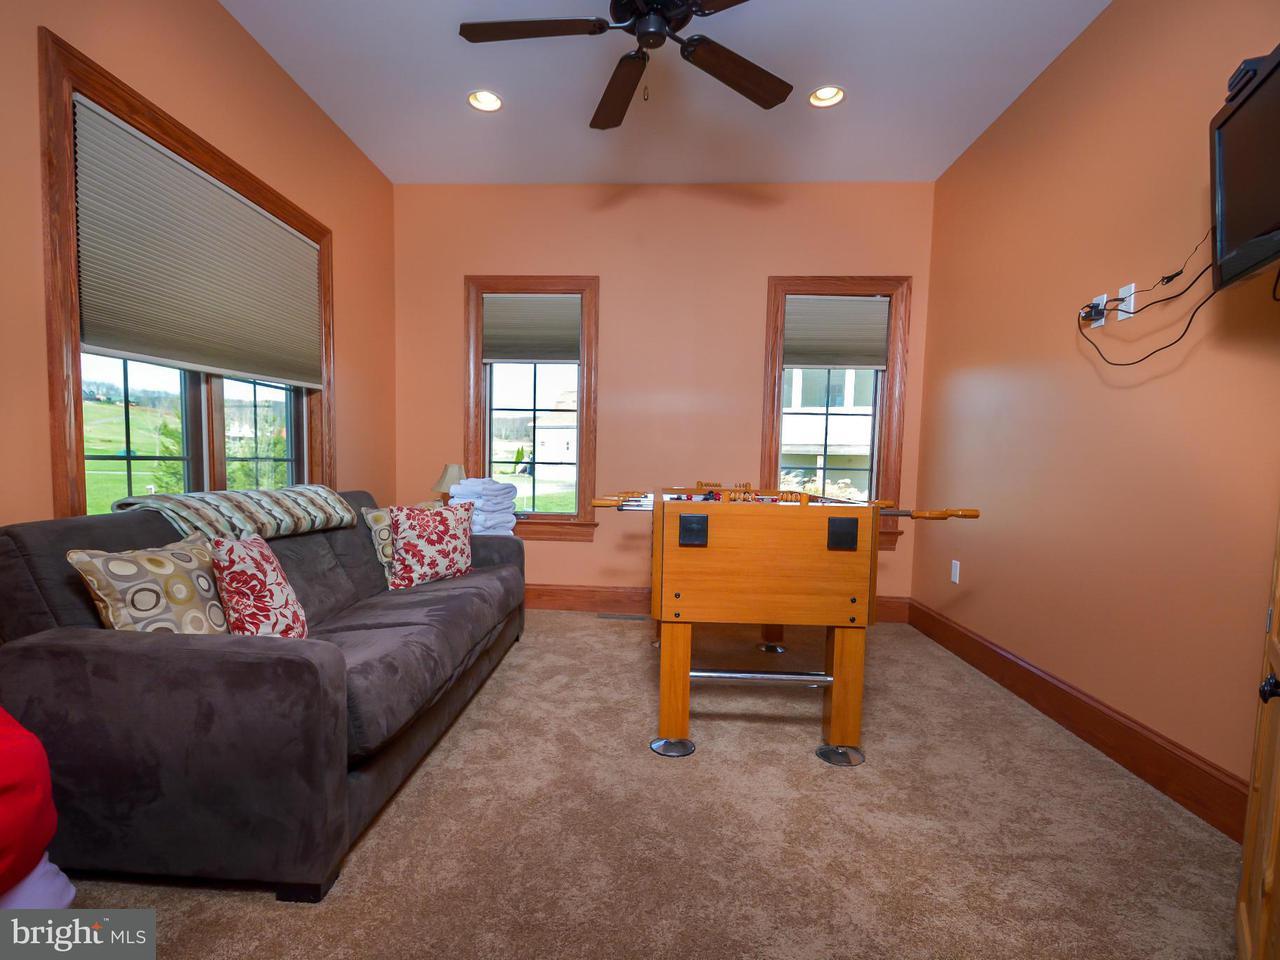 Additional photo for property listing at 222 LAKEFRONT LINKS Drive 222 LAKEFRONT LINKS Drive Swanton, Maryland 21561 Estados Unidos